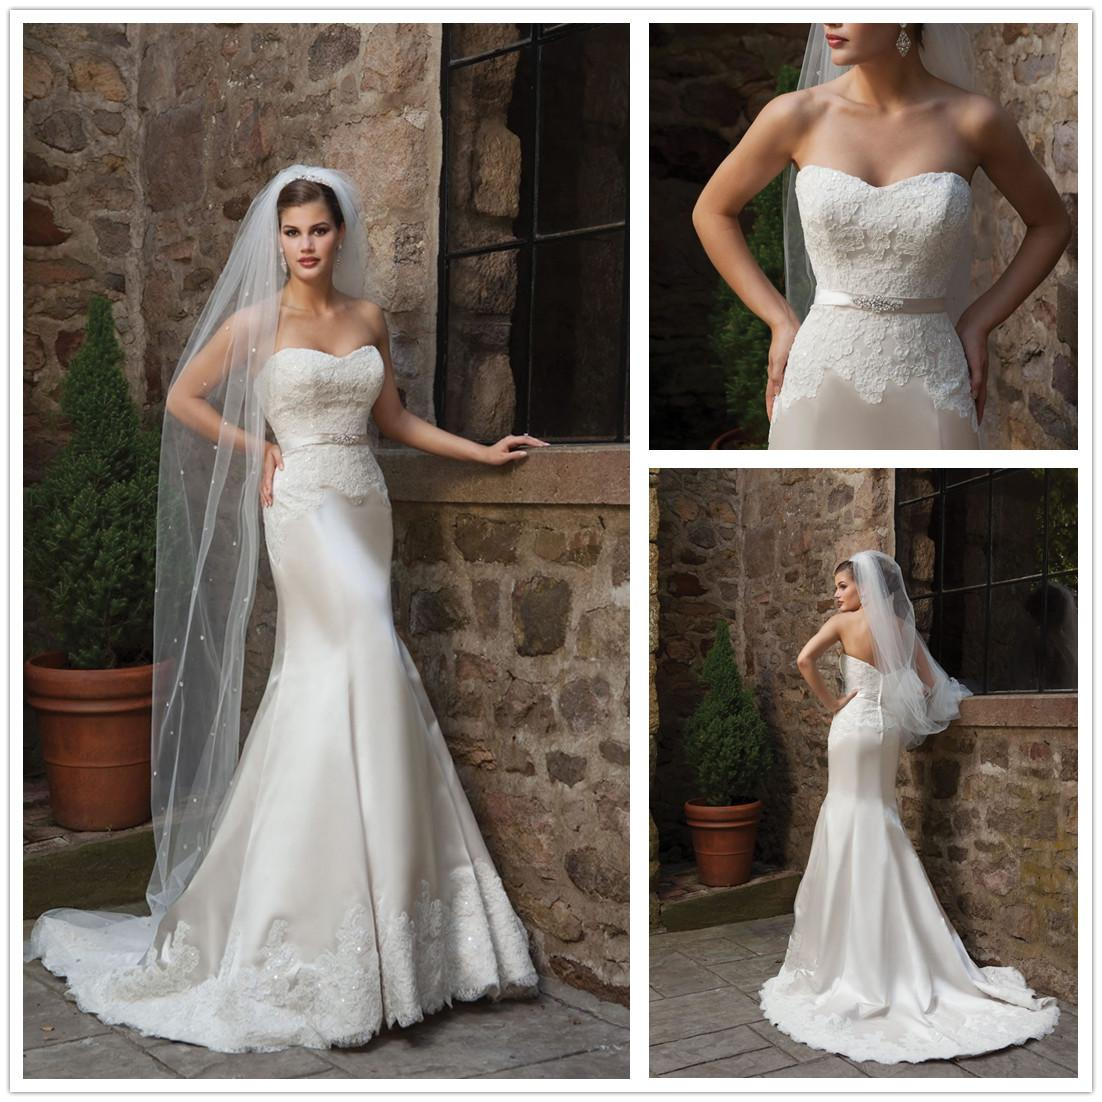 High end 2015 new satin wedding dress mermaid style for High end wedding dress